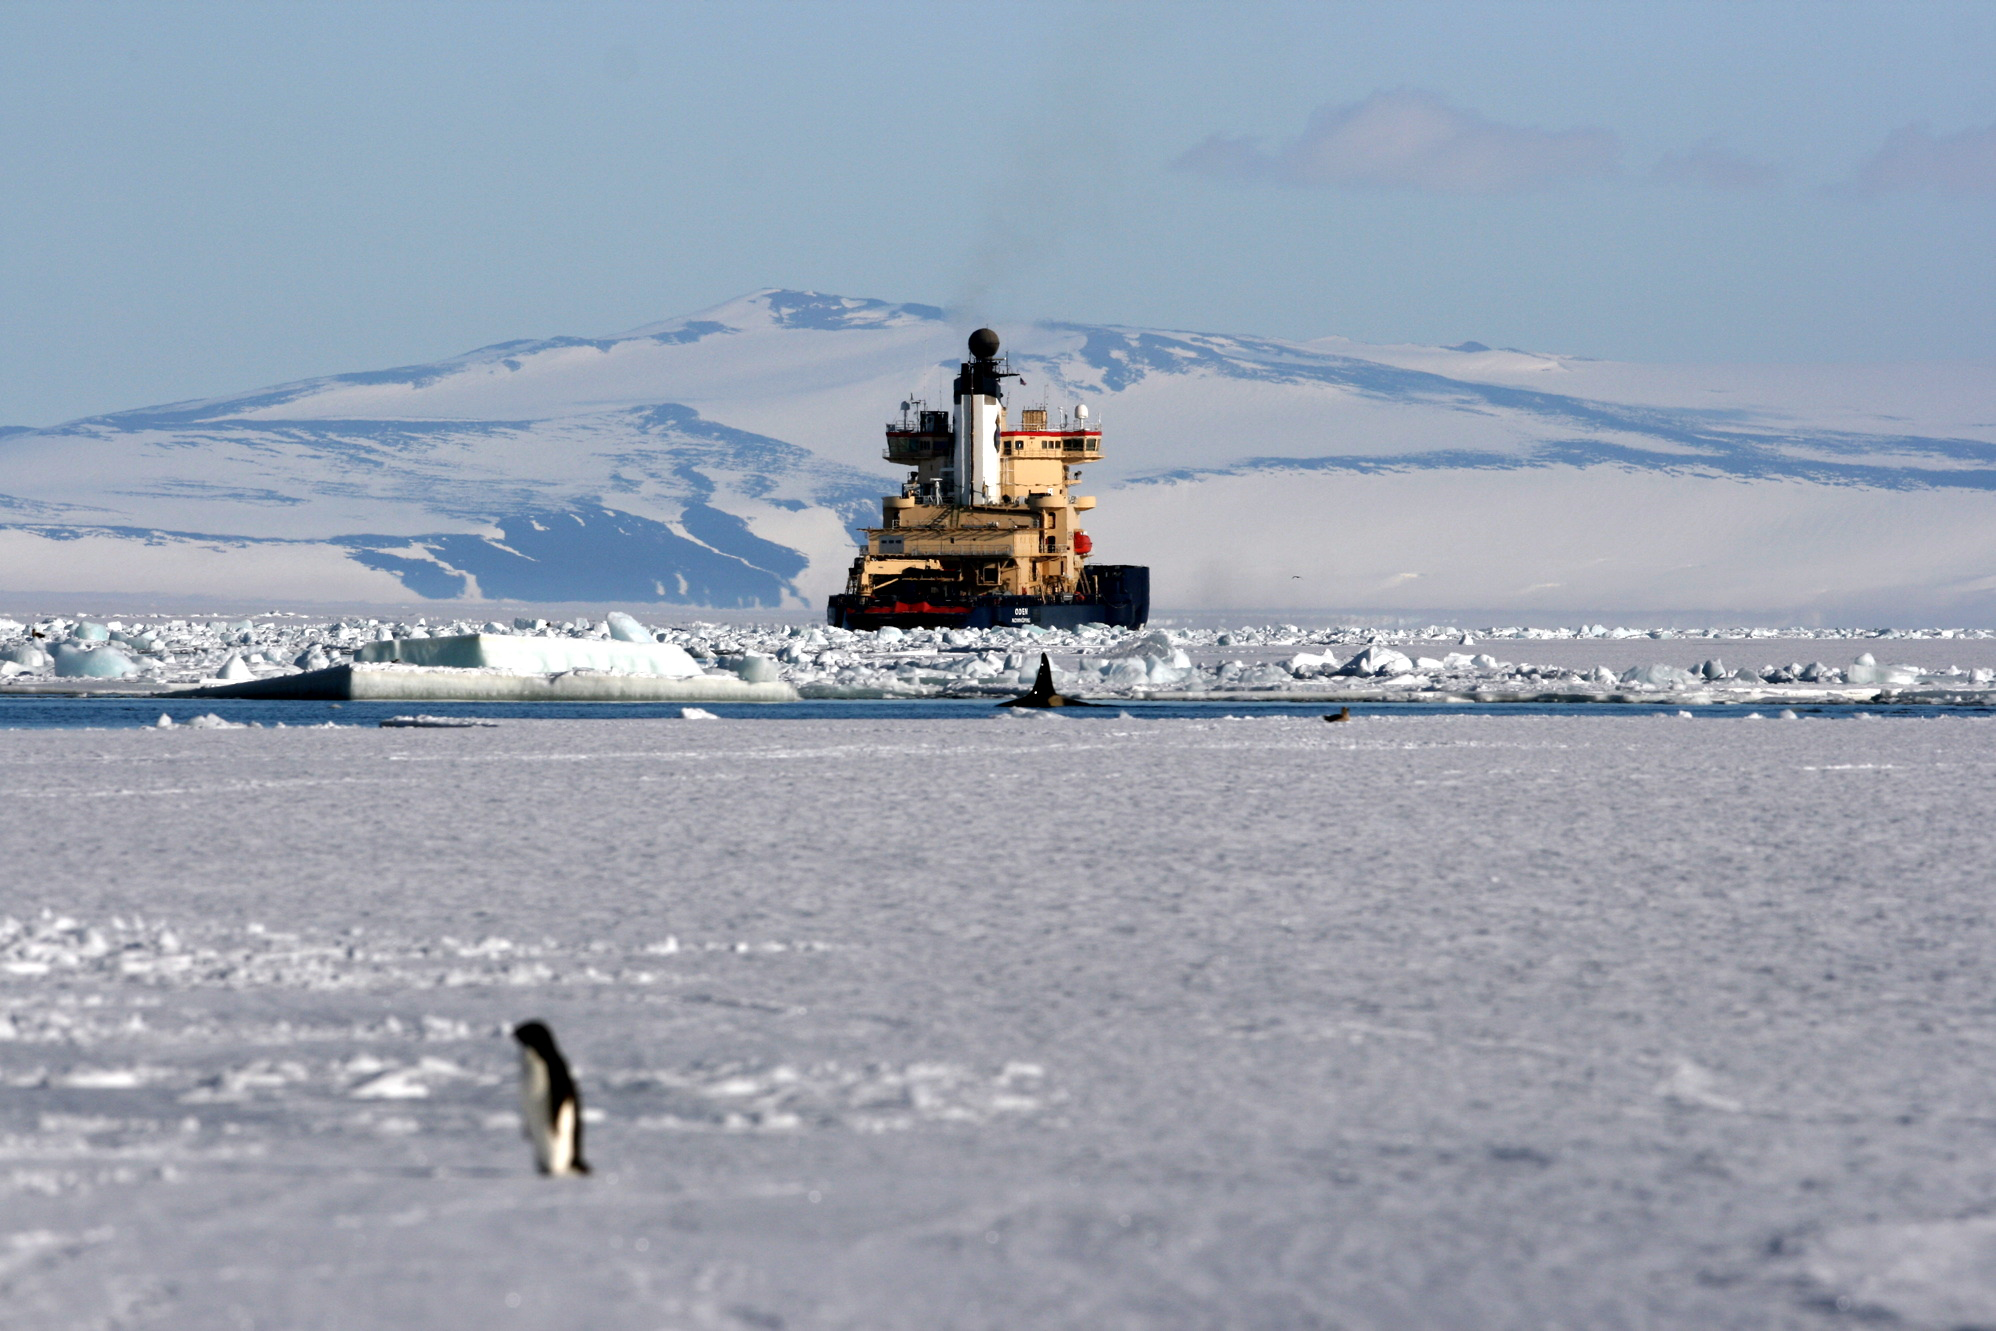 Icebreaker on the Antarctic coast